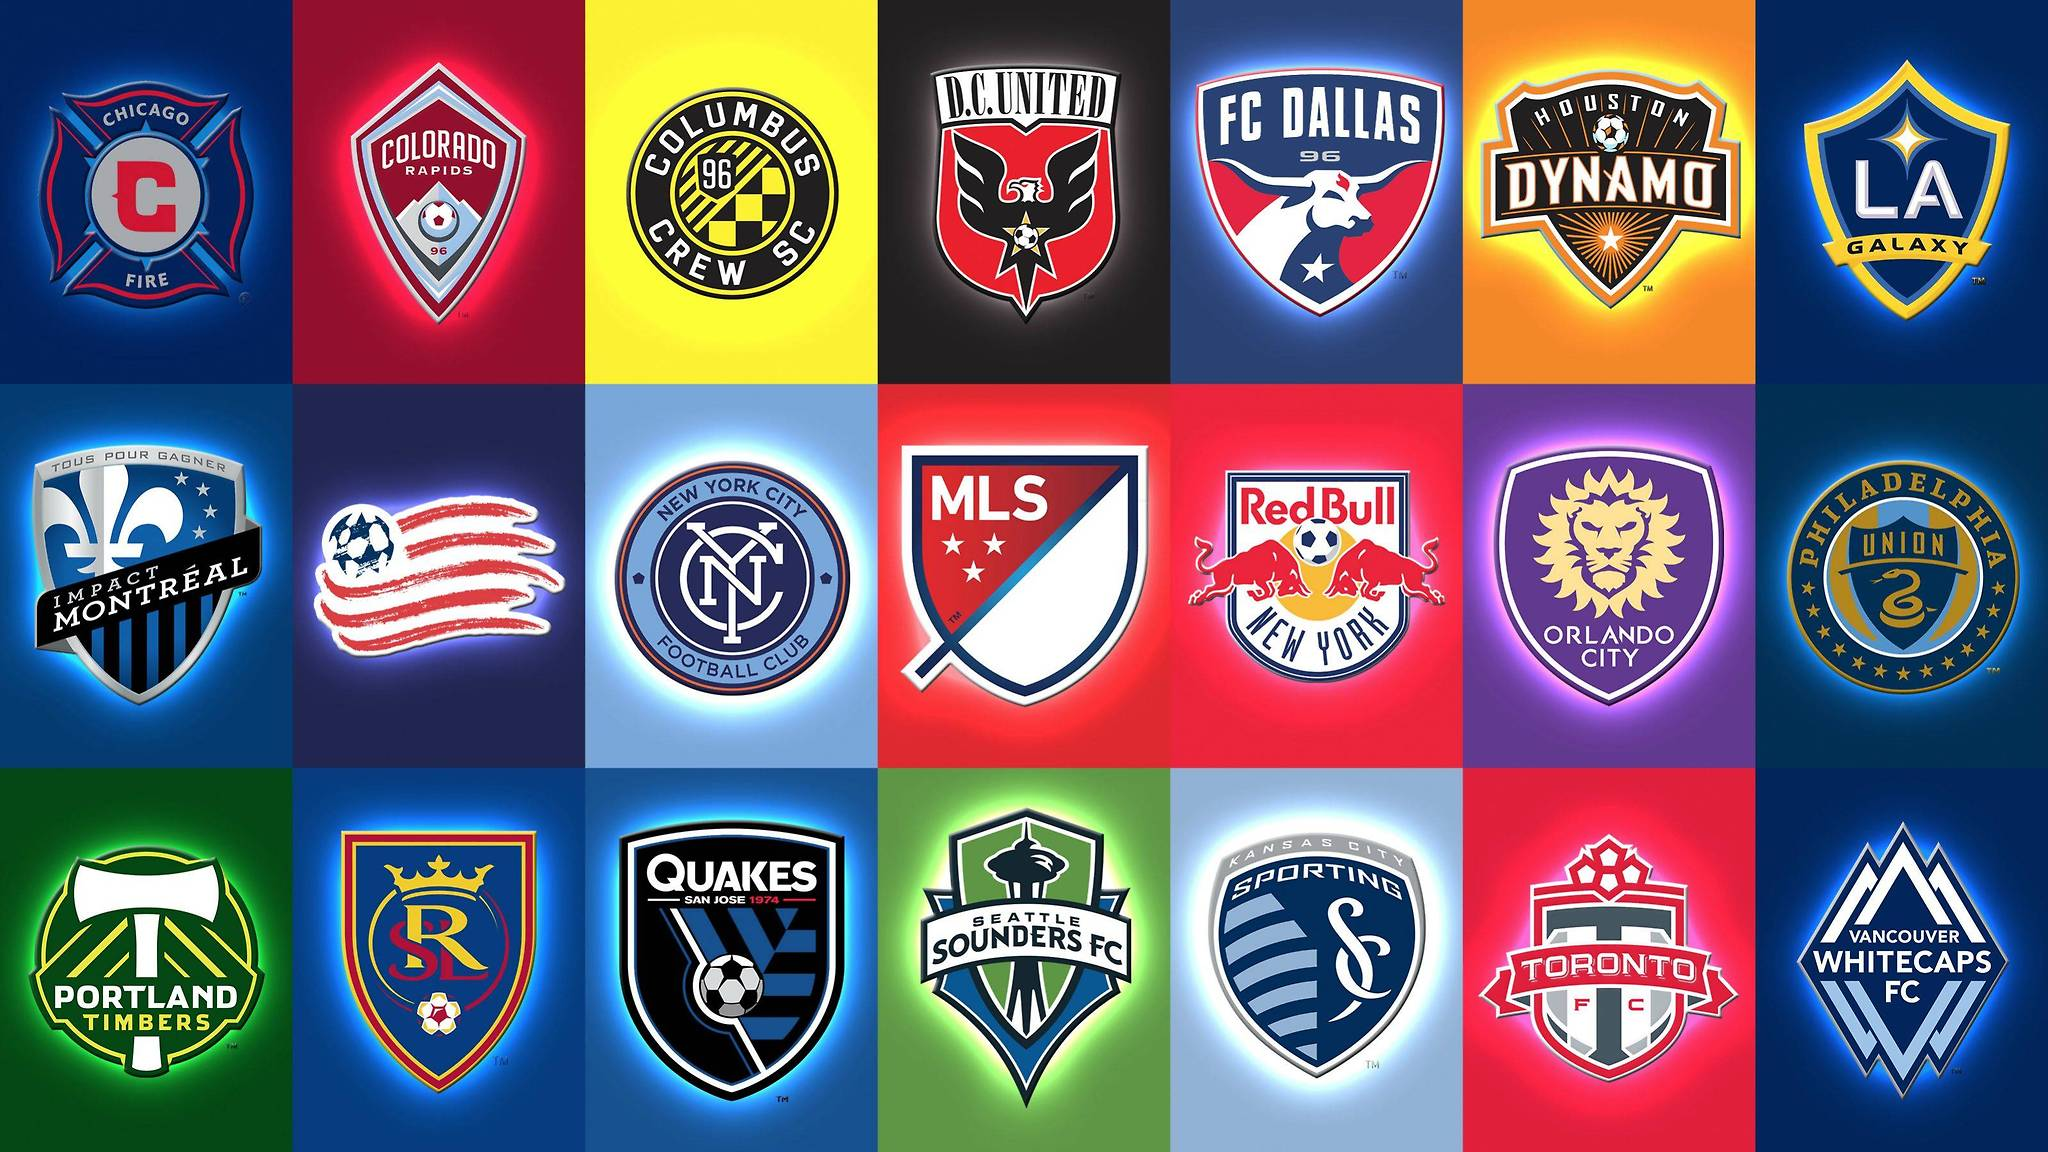 Atlanta United Fc Iphone Wallpaper Guida E Regole Mls Football Manager Giangioman